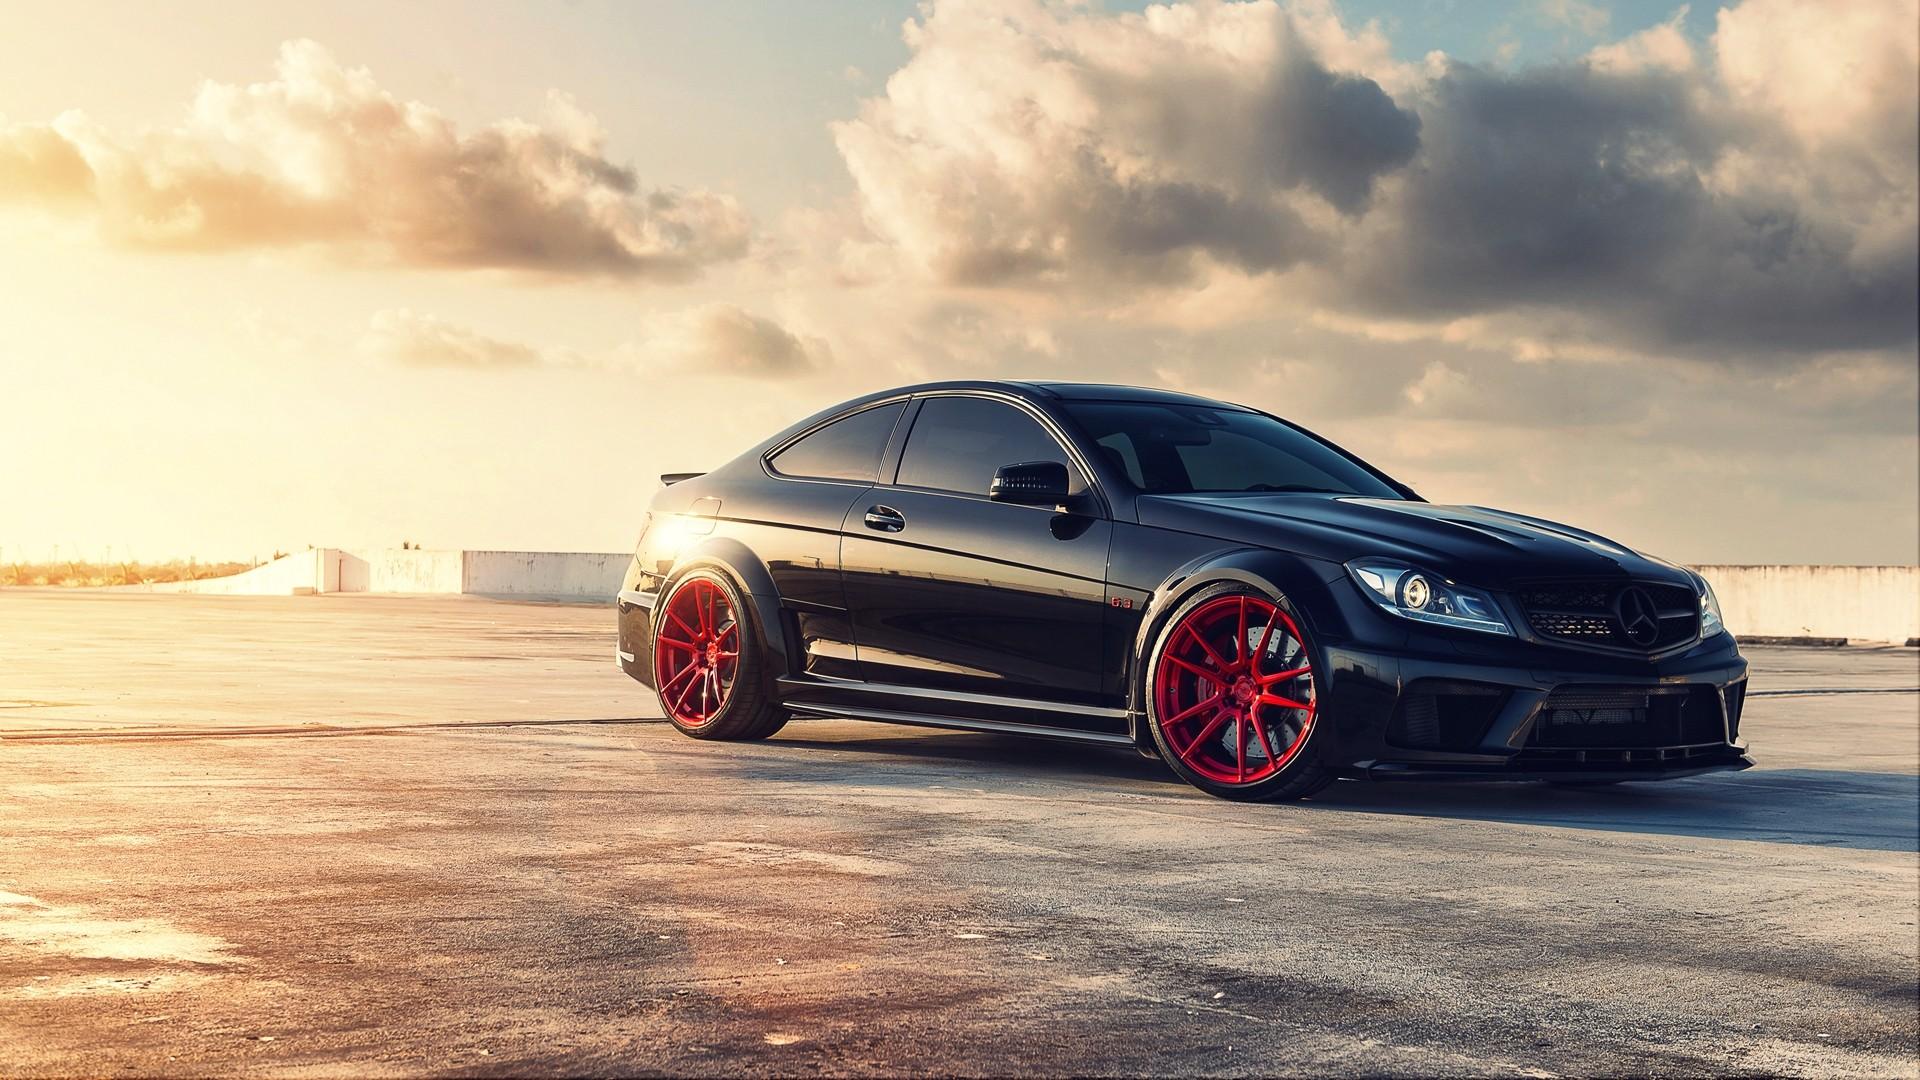 Wallpaper : BMW, Mercedes Benz, sports car, Convertible, performance car, Sedan, C63 AMG, wheel ...